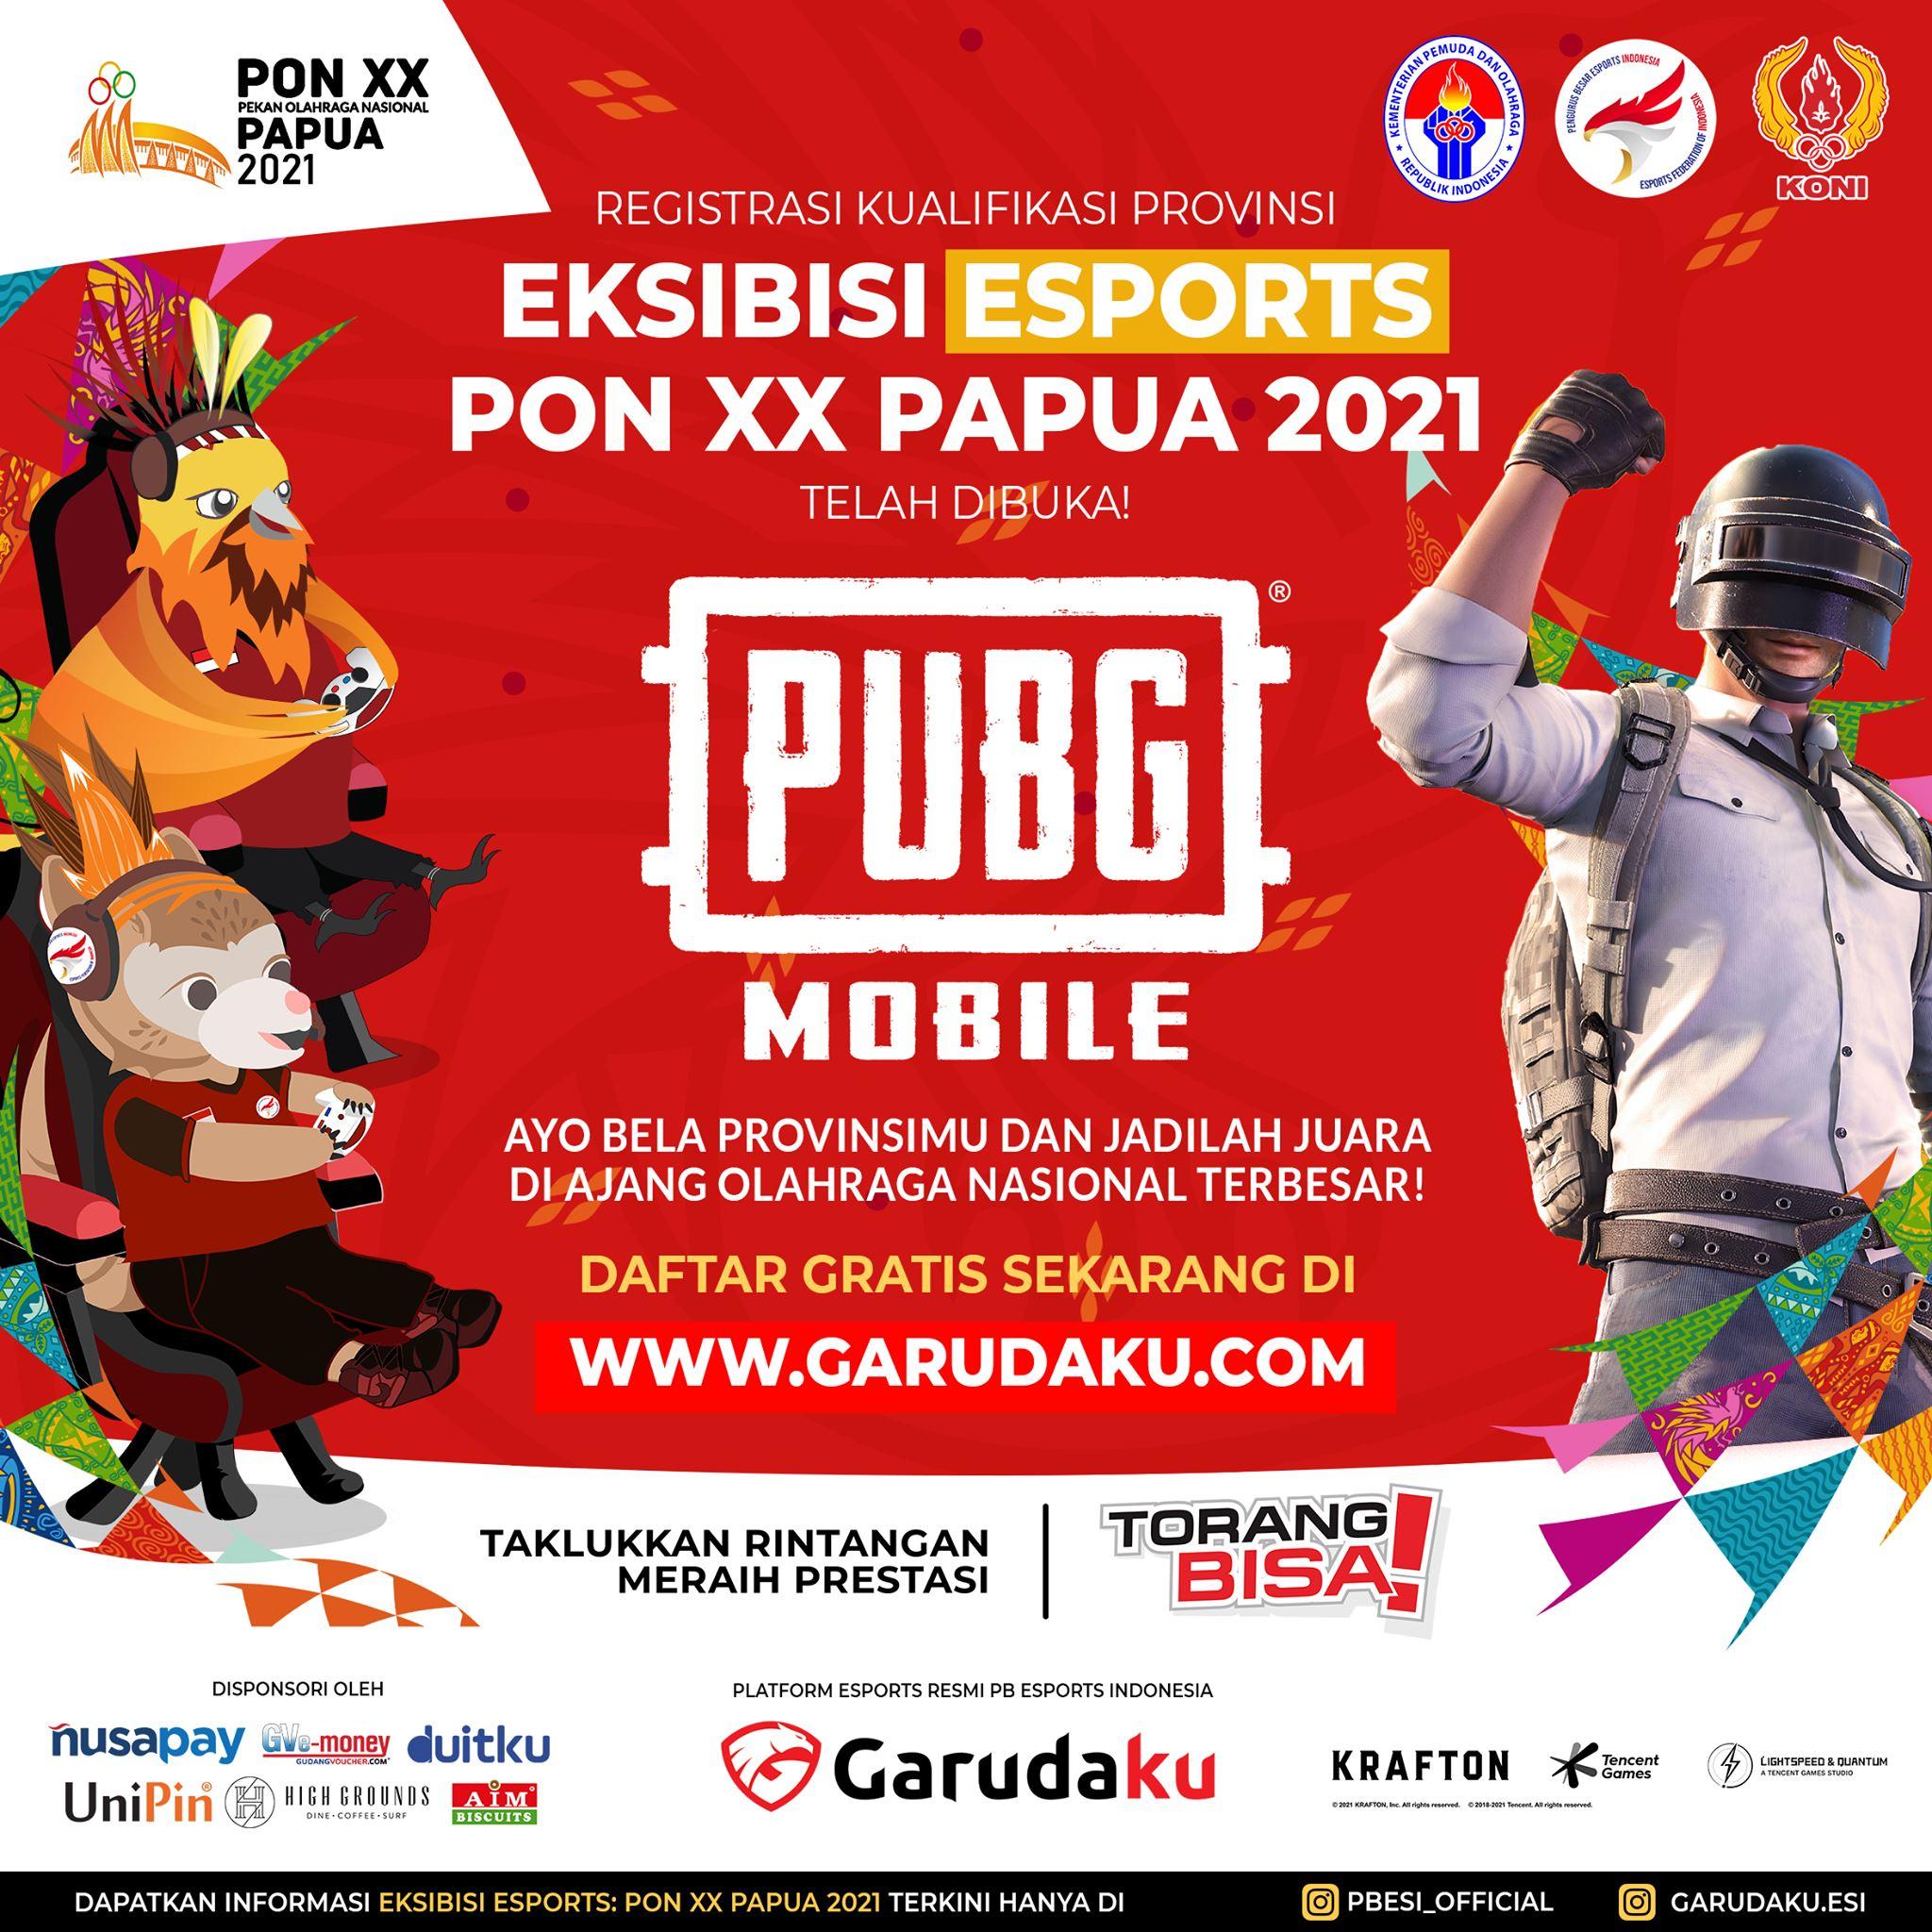 registrasi kualifikasi provinsi eksibisi esports PON XX Papua 2021